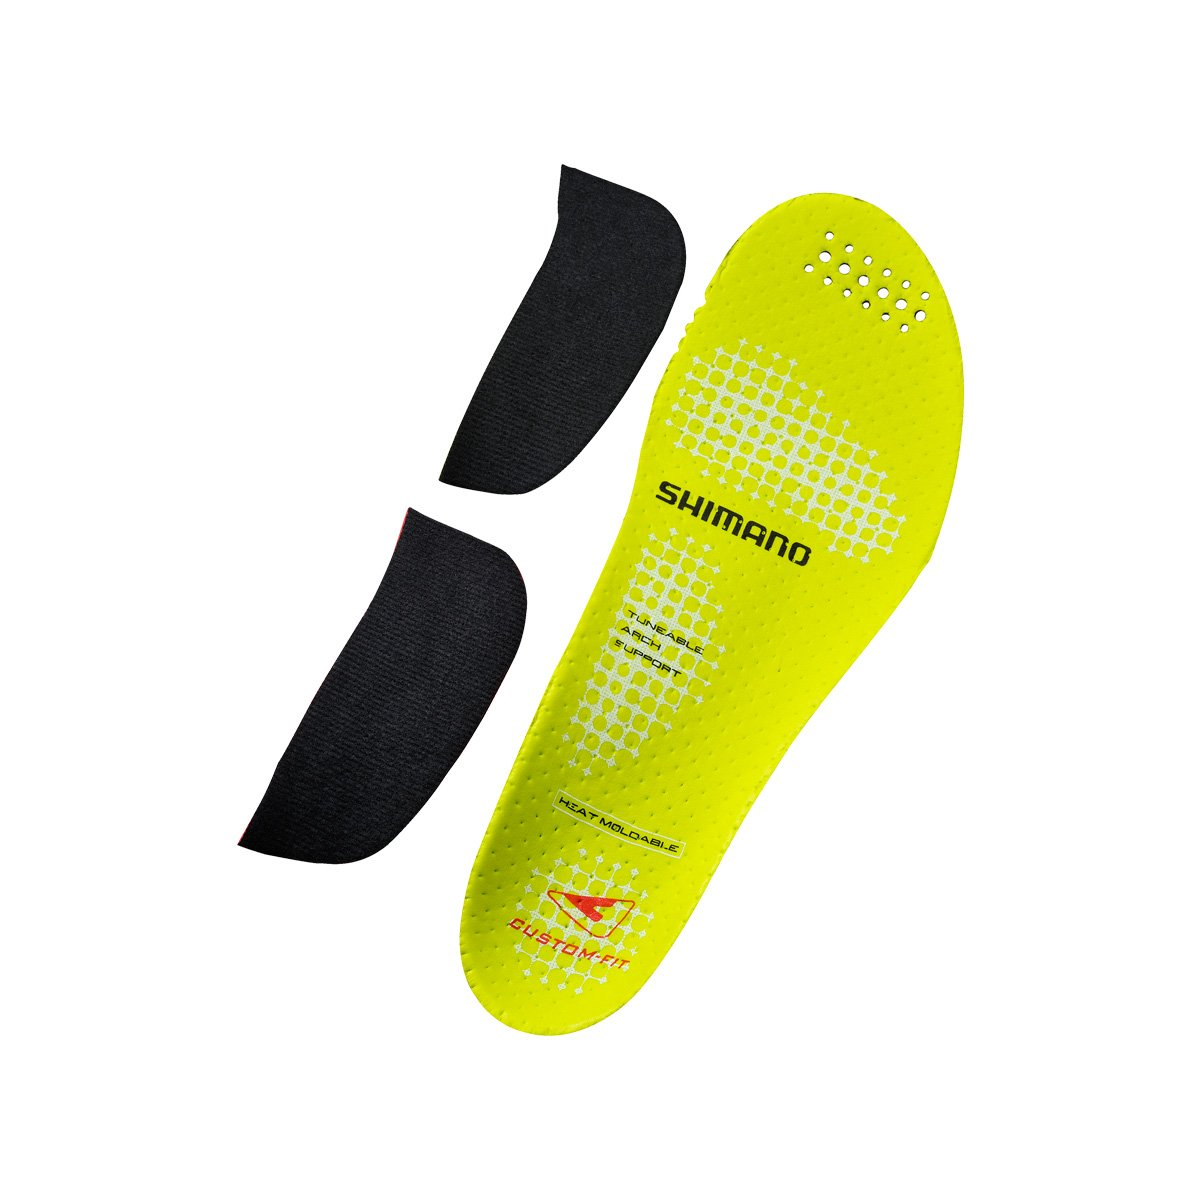 SHIMANO Custom Fit Cycling Shoe Insole - ESMSHRC9INCF (Yellow - 48-50.0)